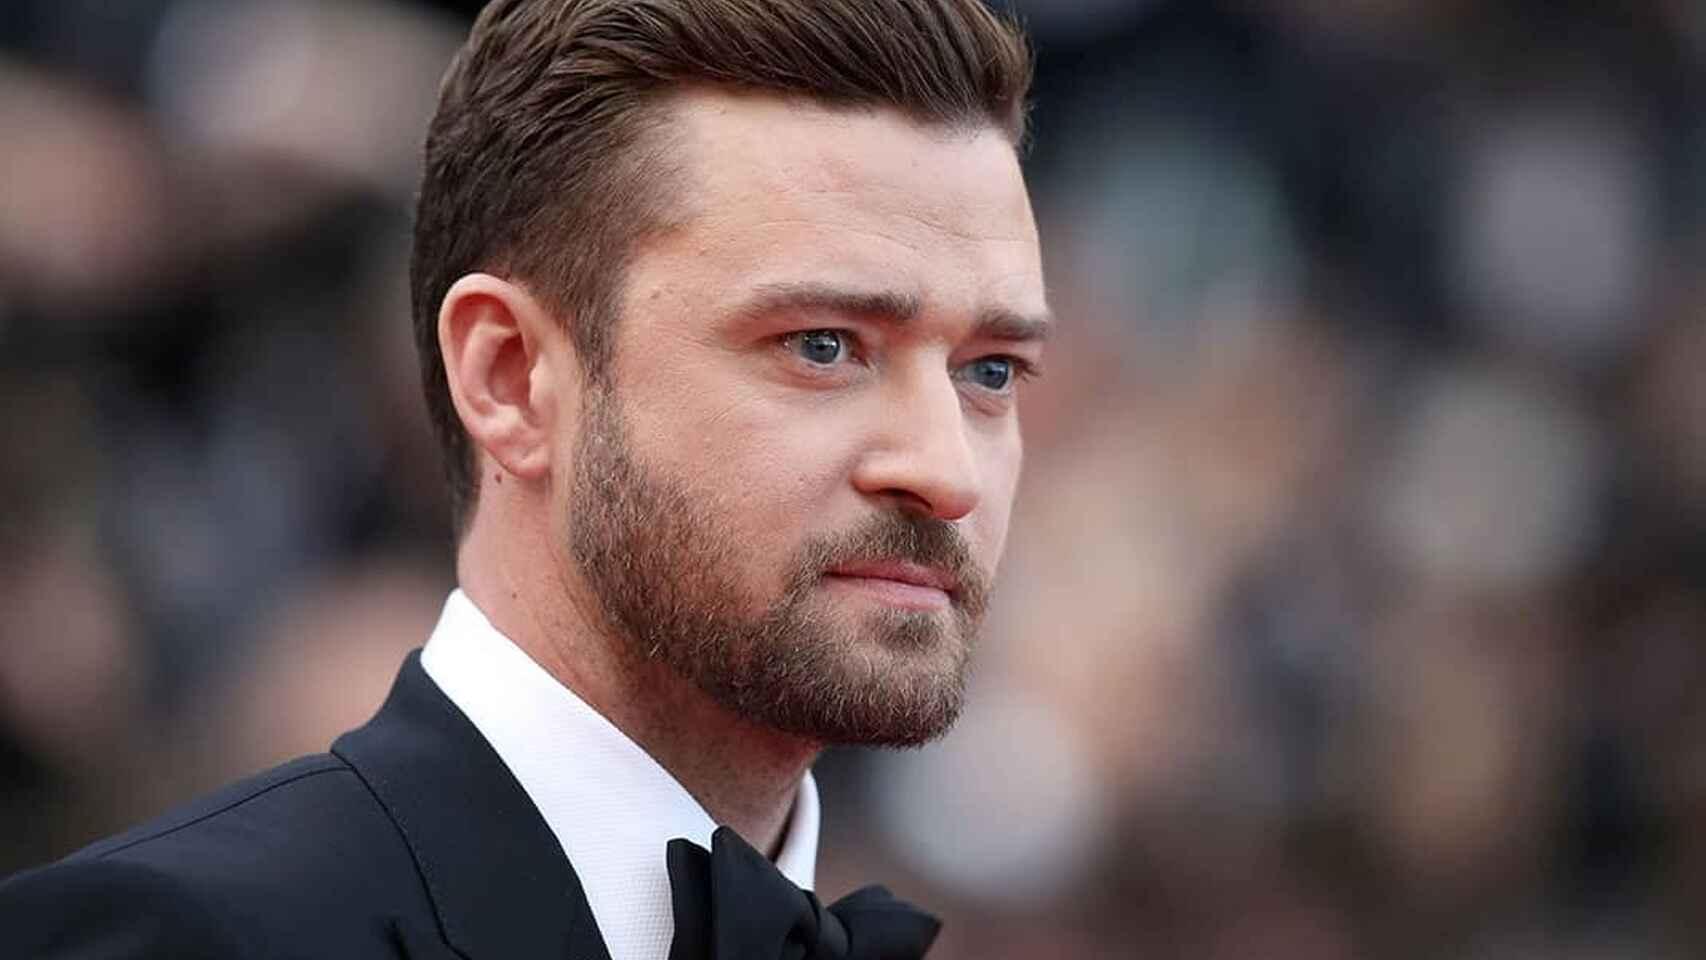 Justin Timberlake anuncia que participará en la toma de posesión de Joe Biden